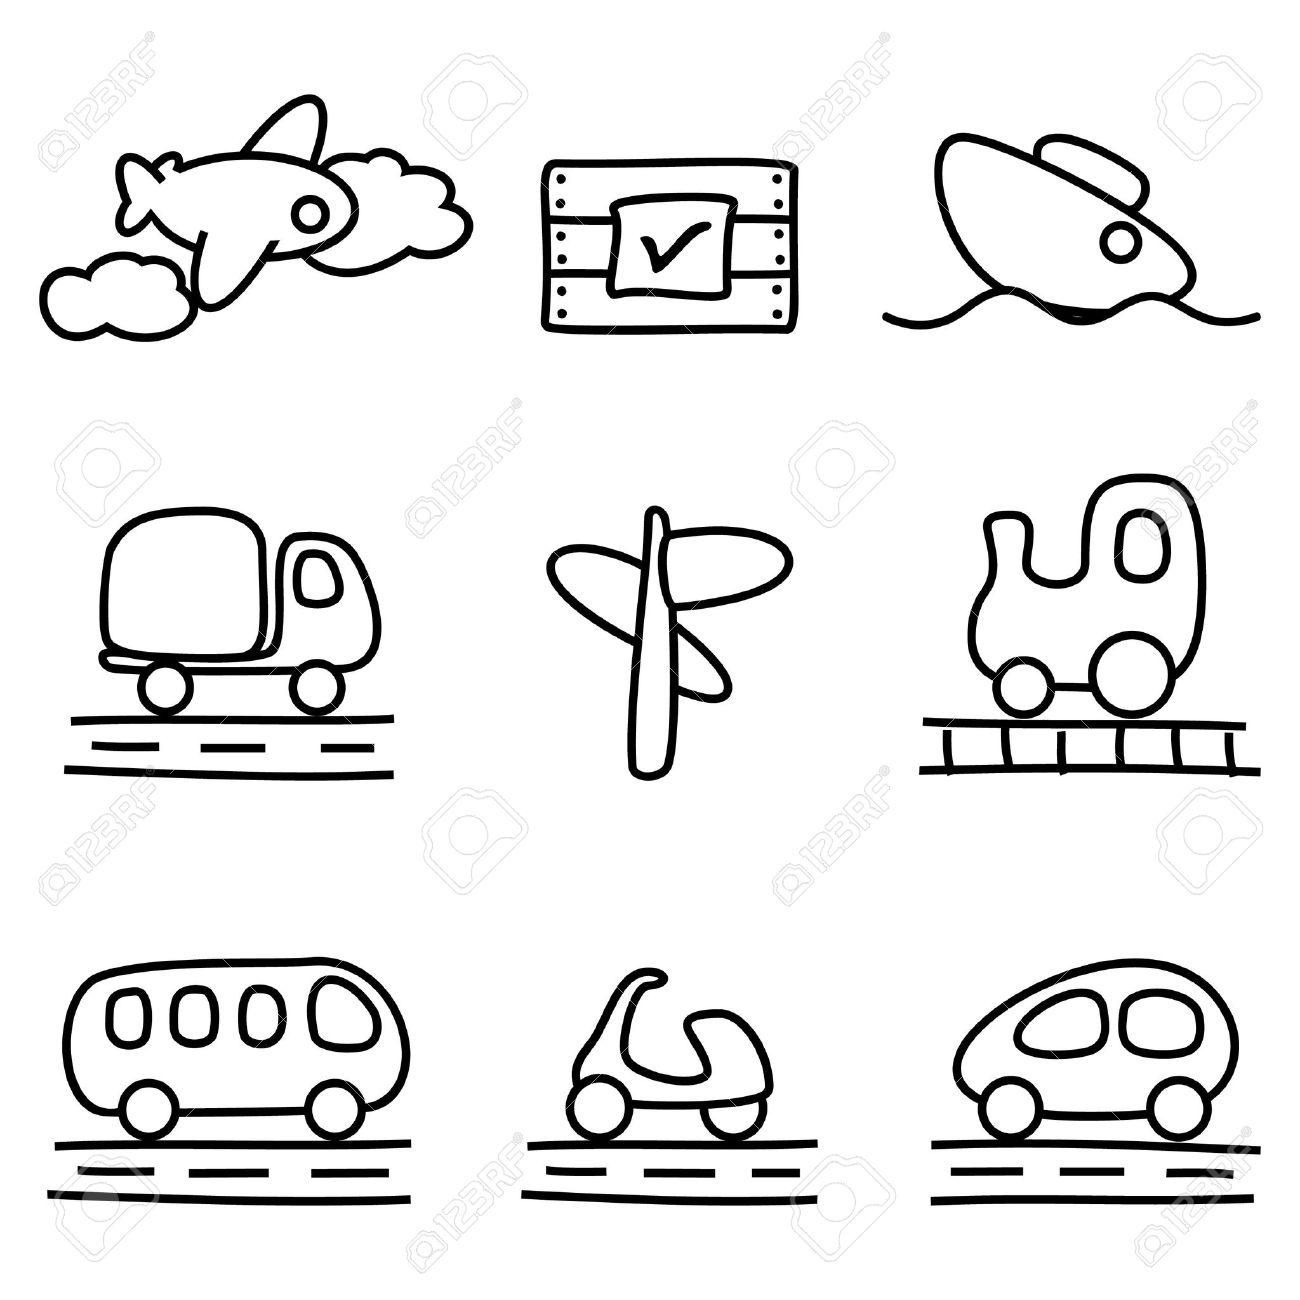 Transportation icons (black and white variation).